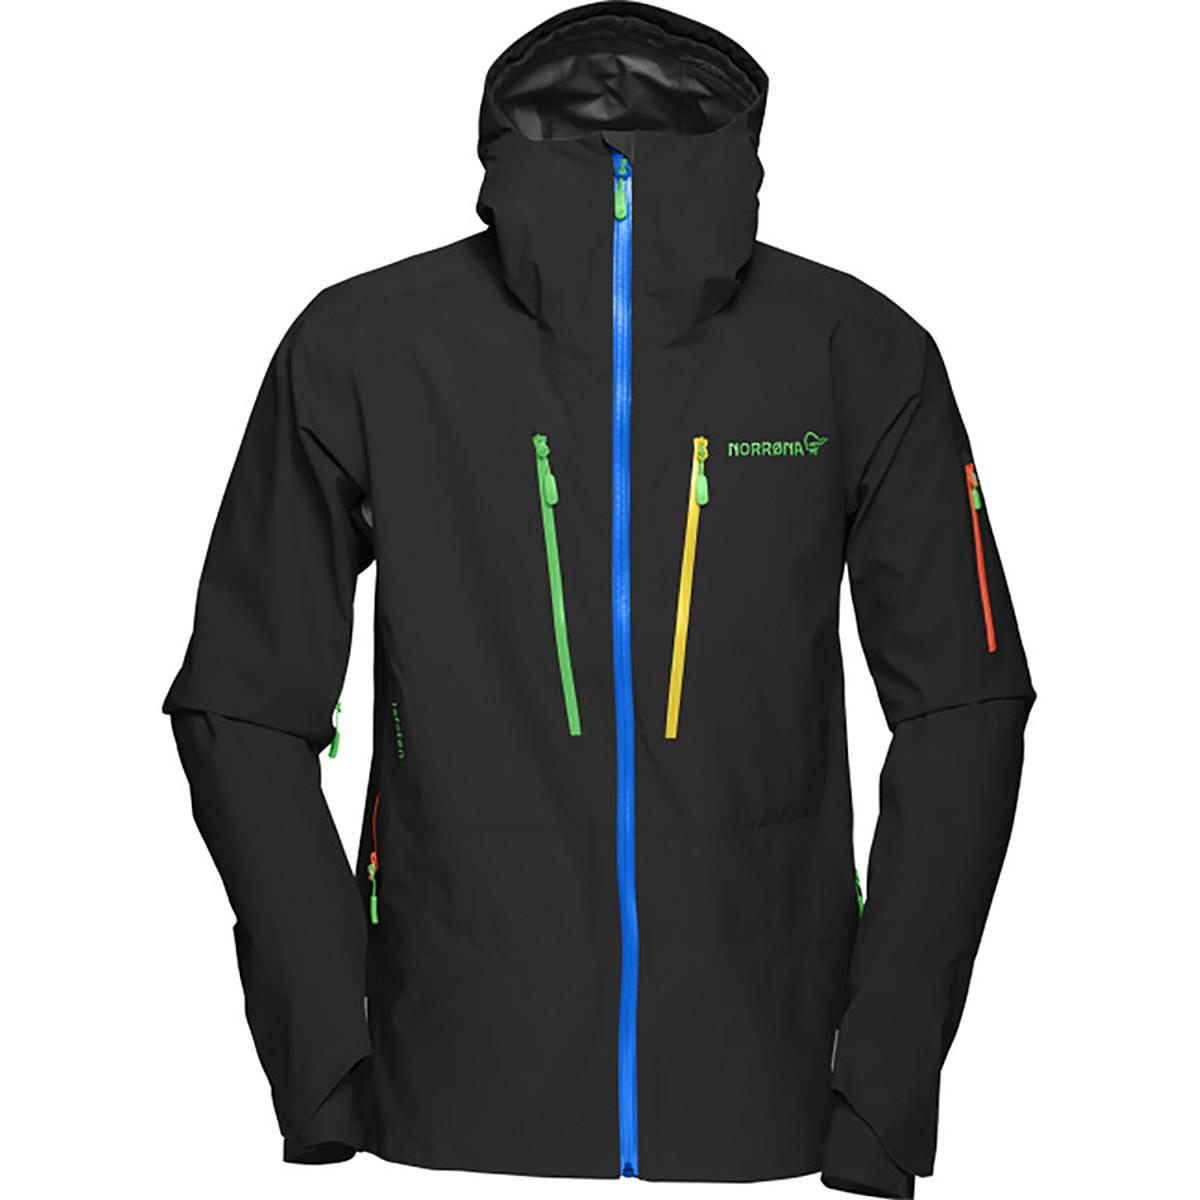 Norrona Lofoten Gore-Tex Pro Shell Jacket